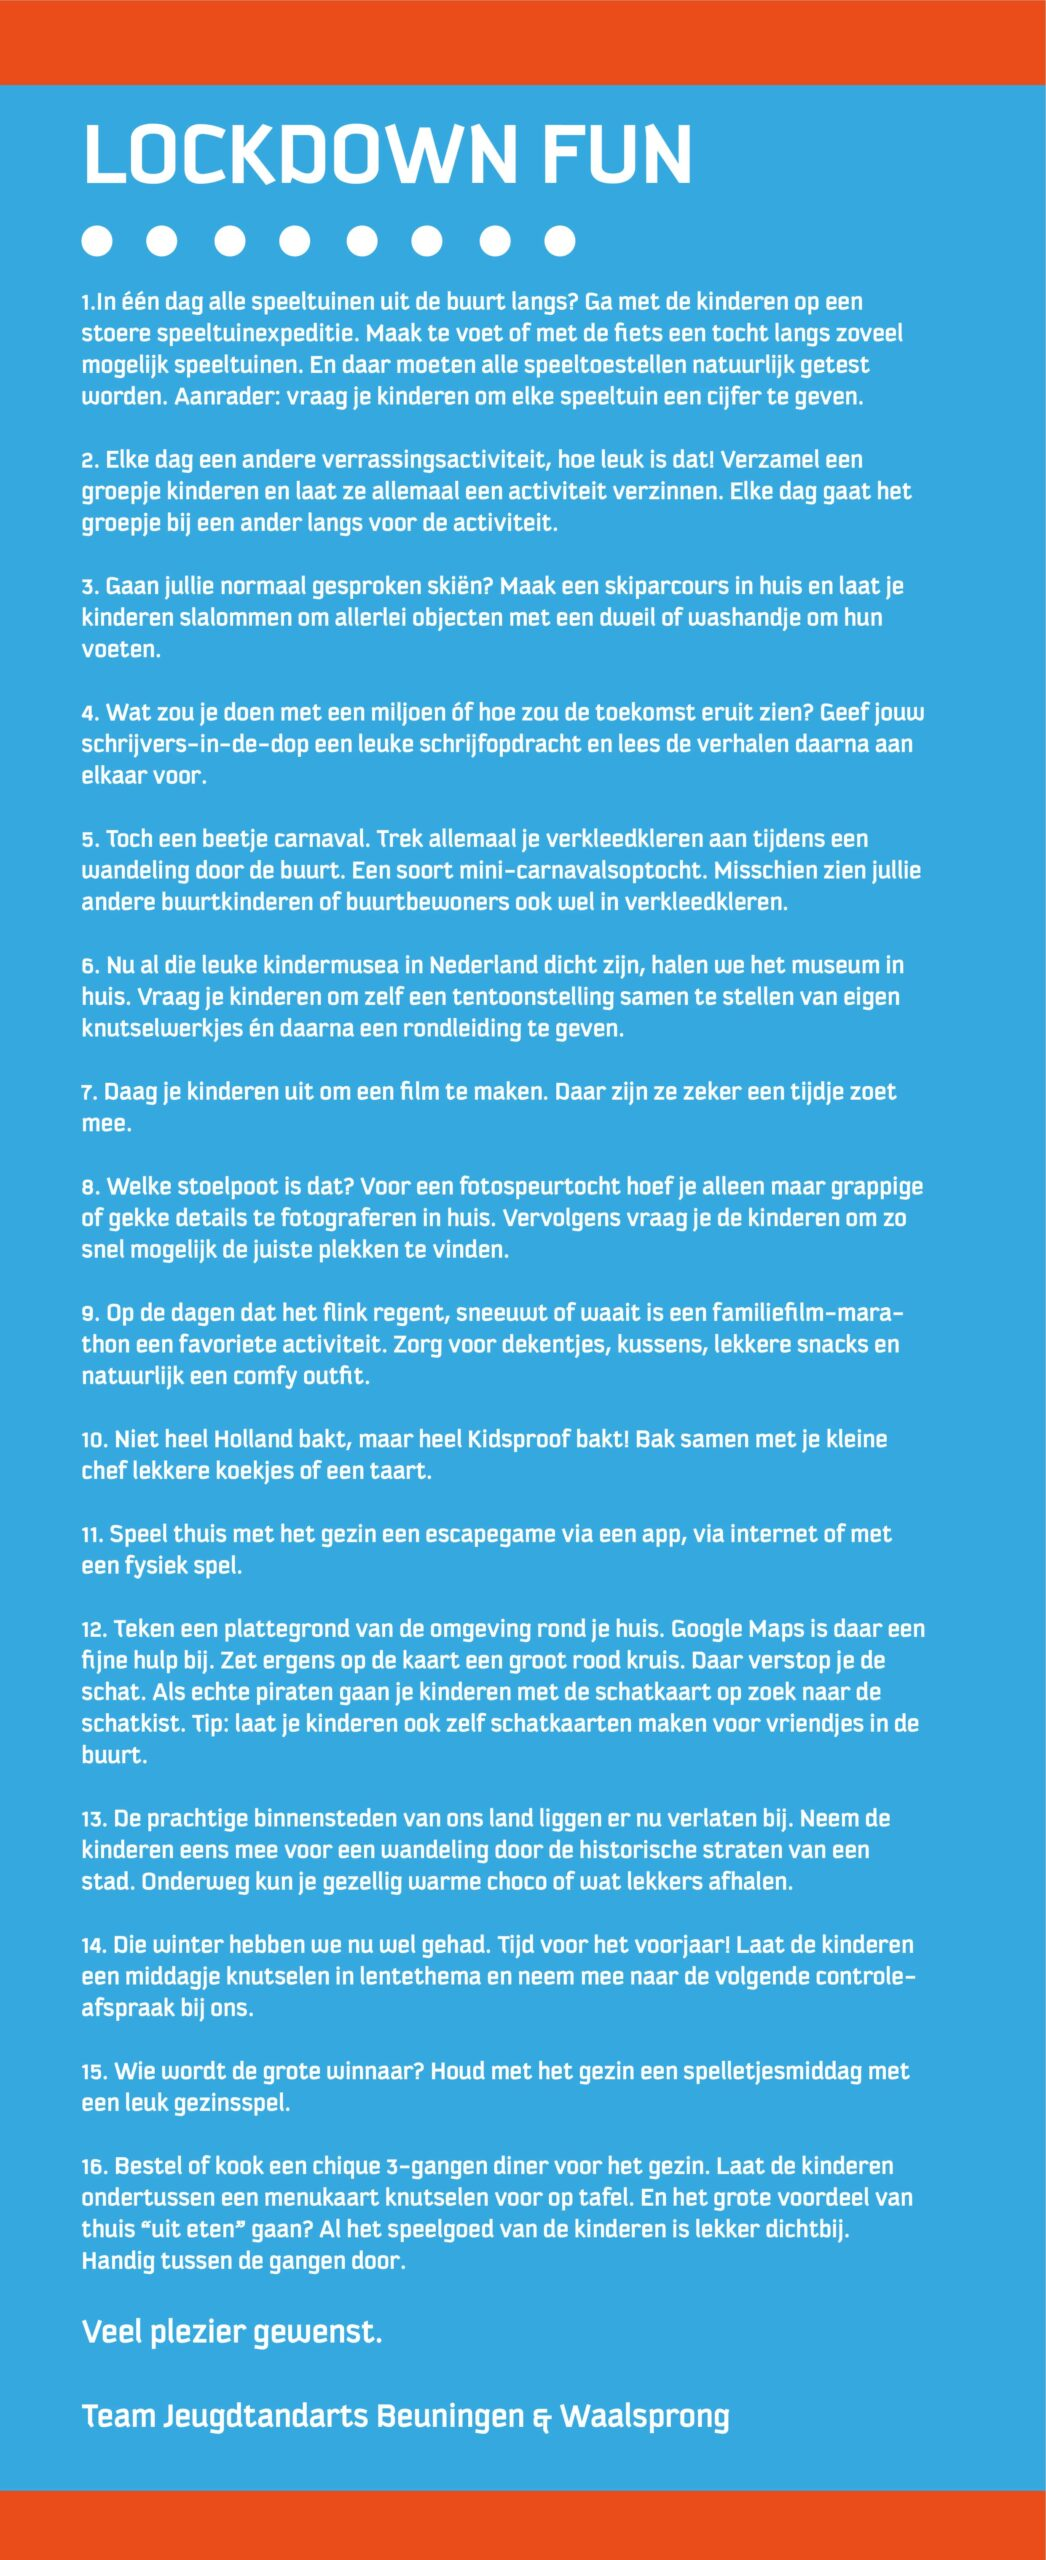 2021_tips_tegen_winterdip_jeugdtandarts_blog-01-01-min 2